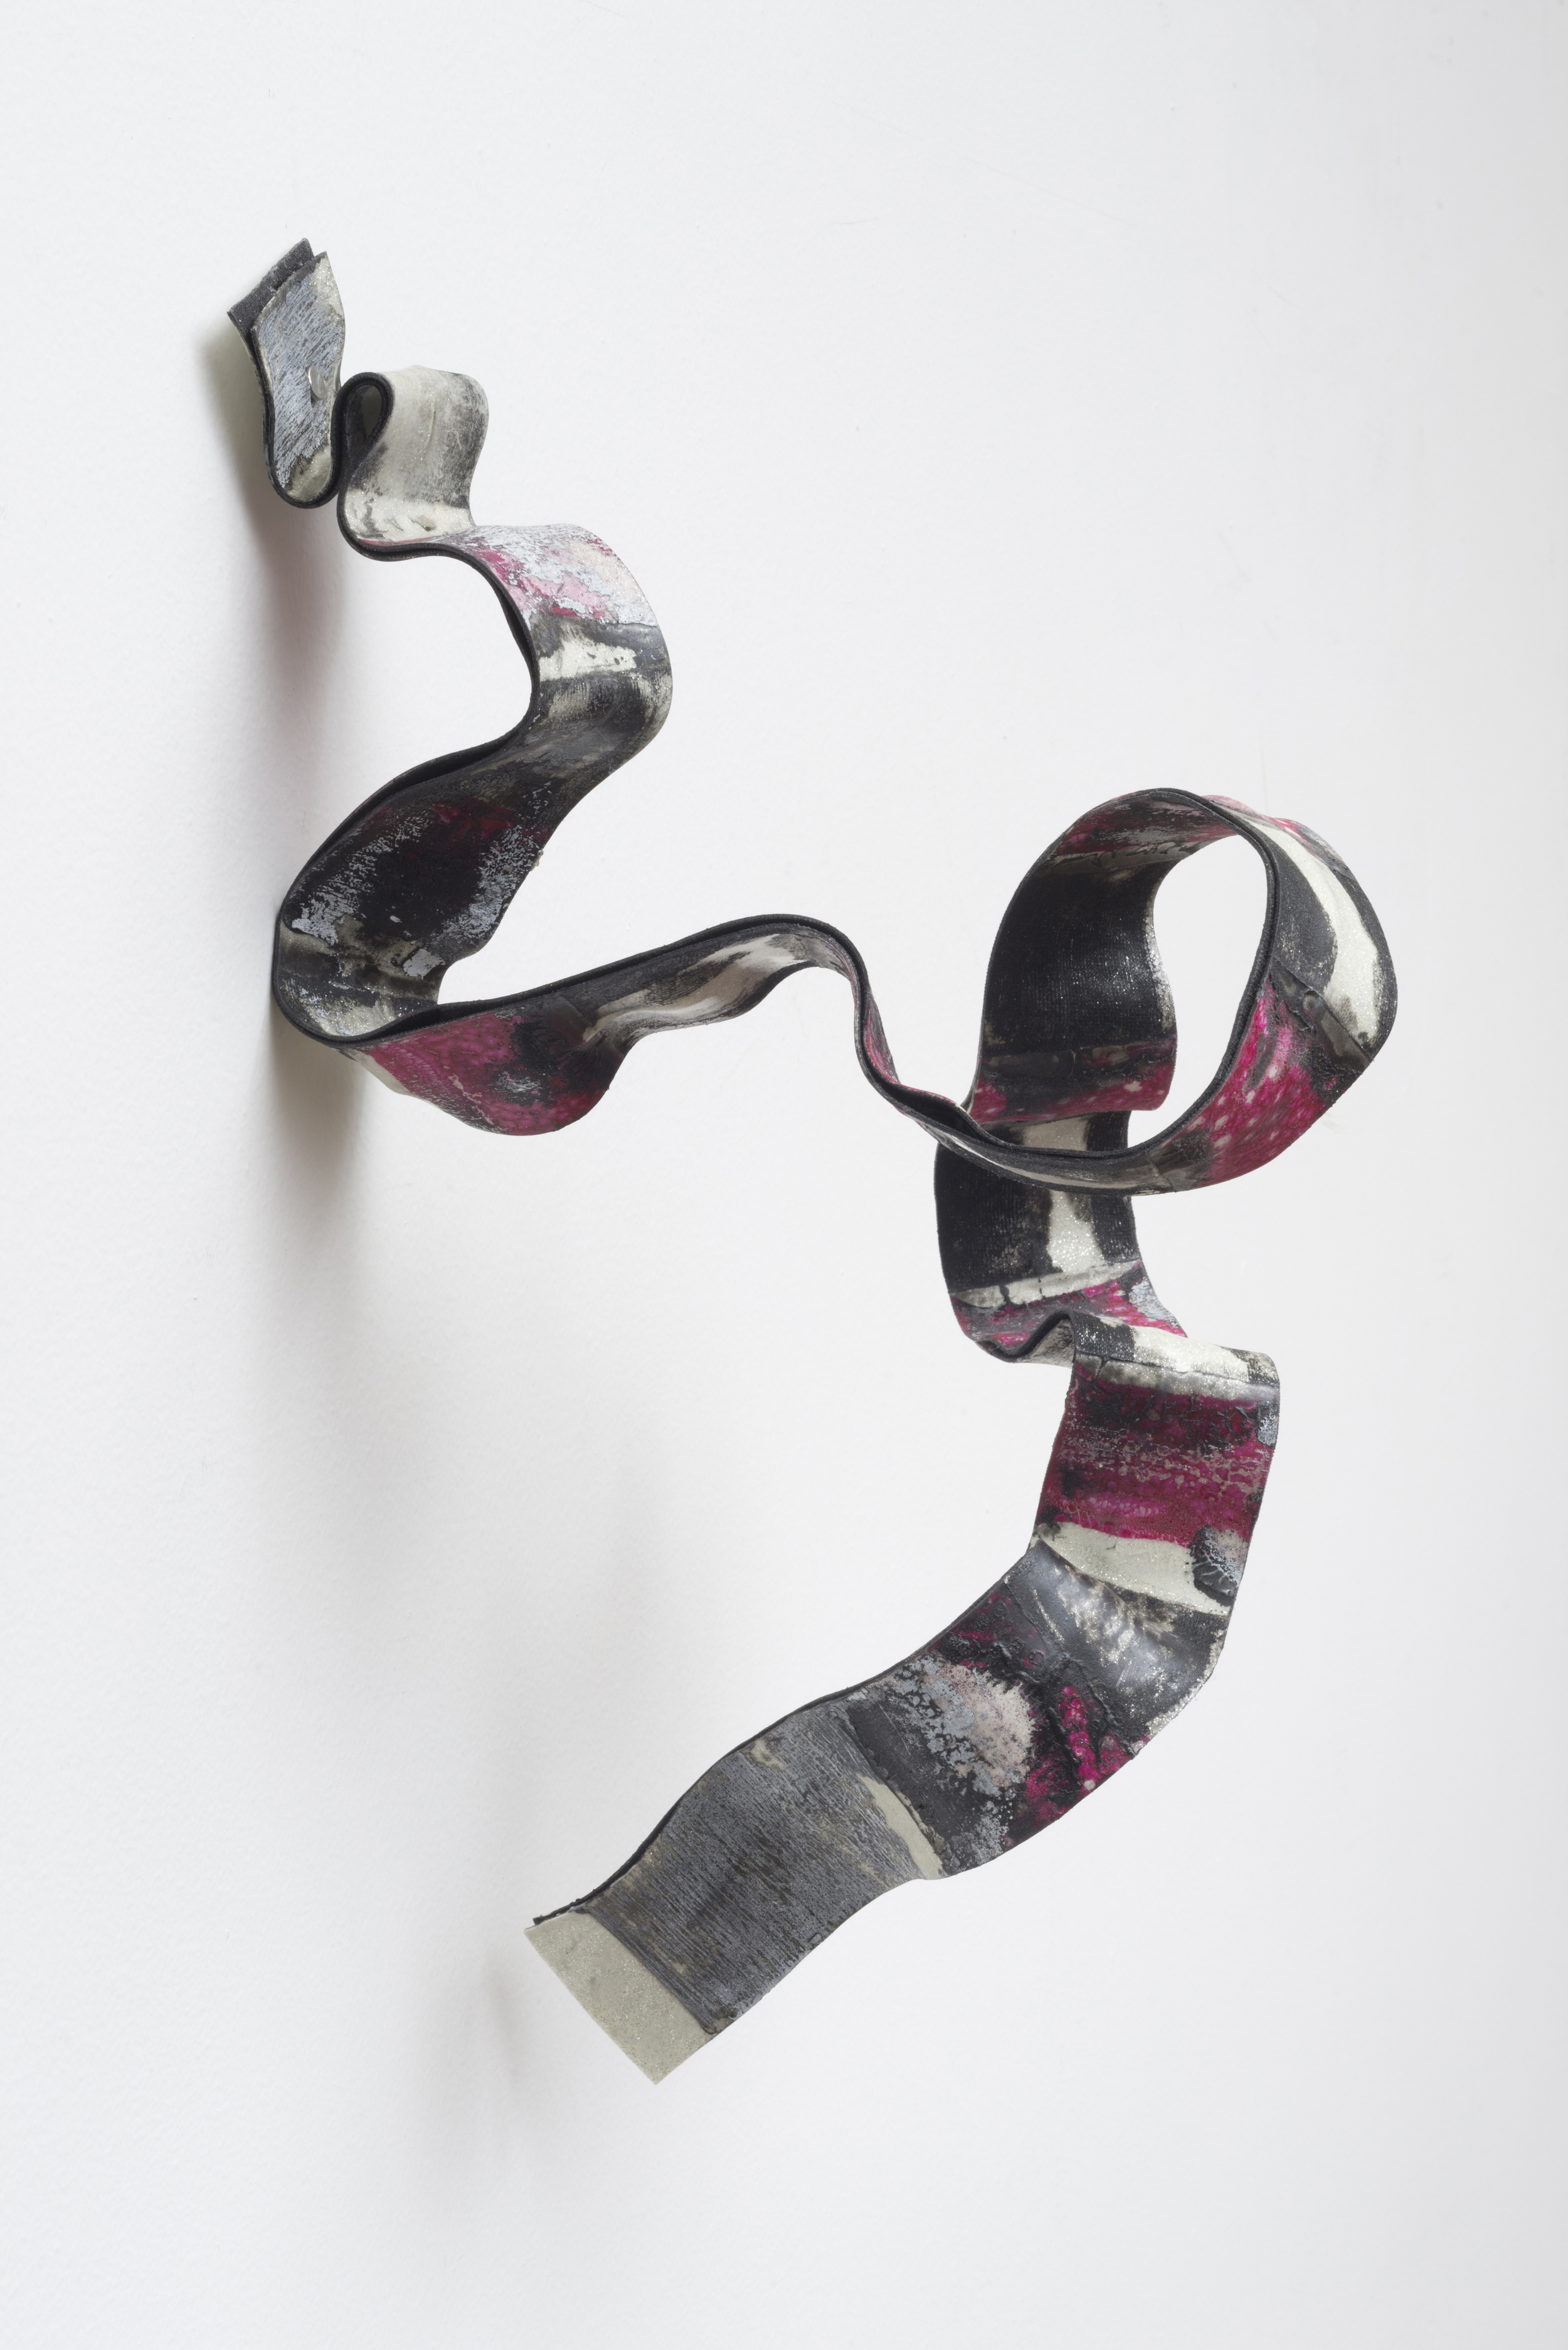 Untitled (01), 2013